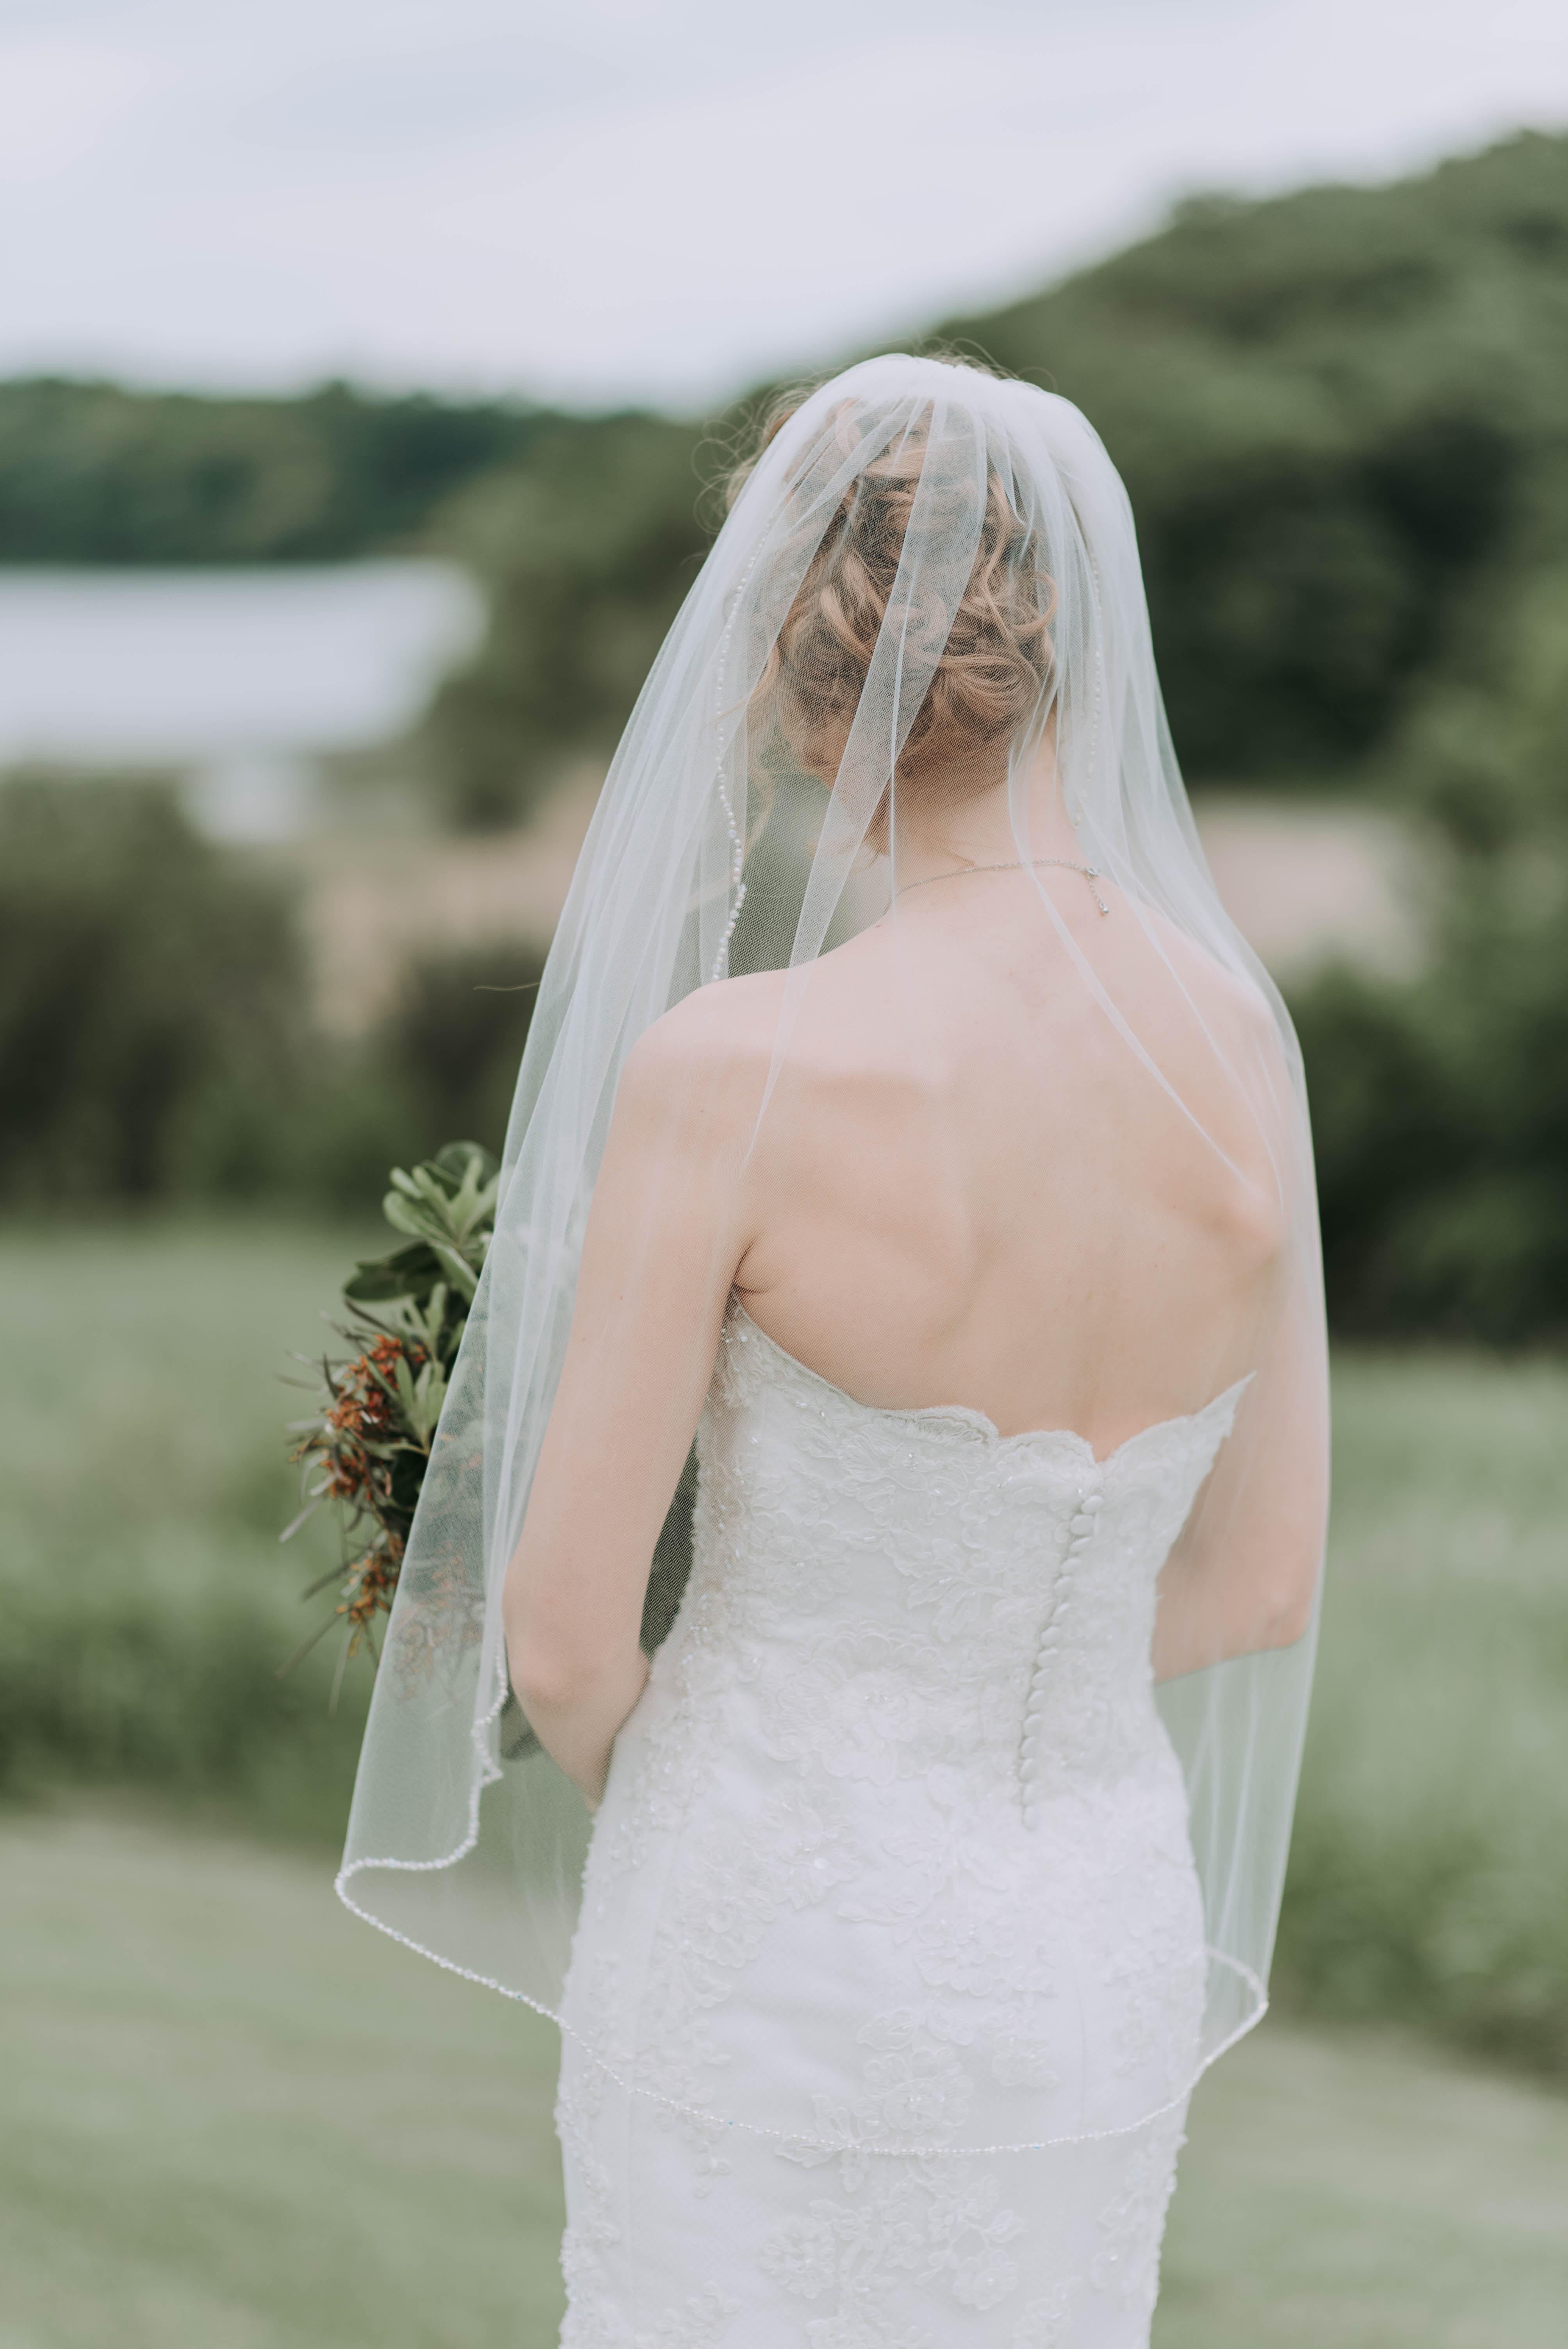 woman wearing white wedding dress holding bouquet